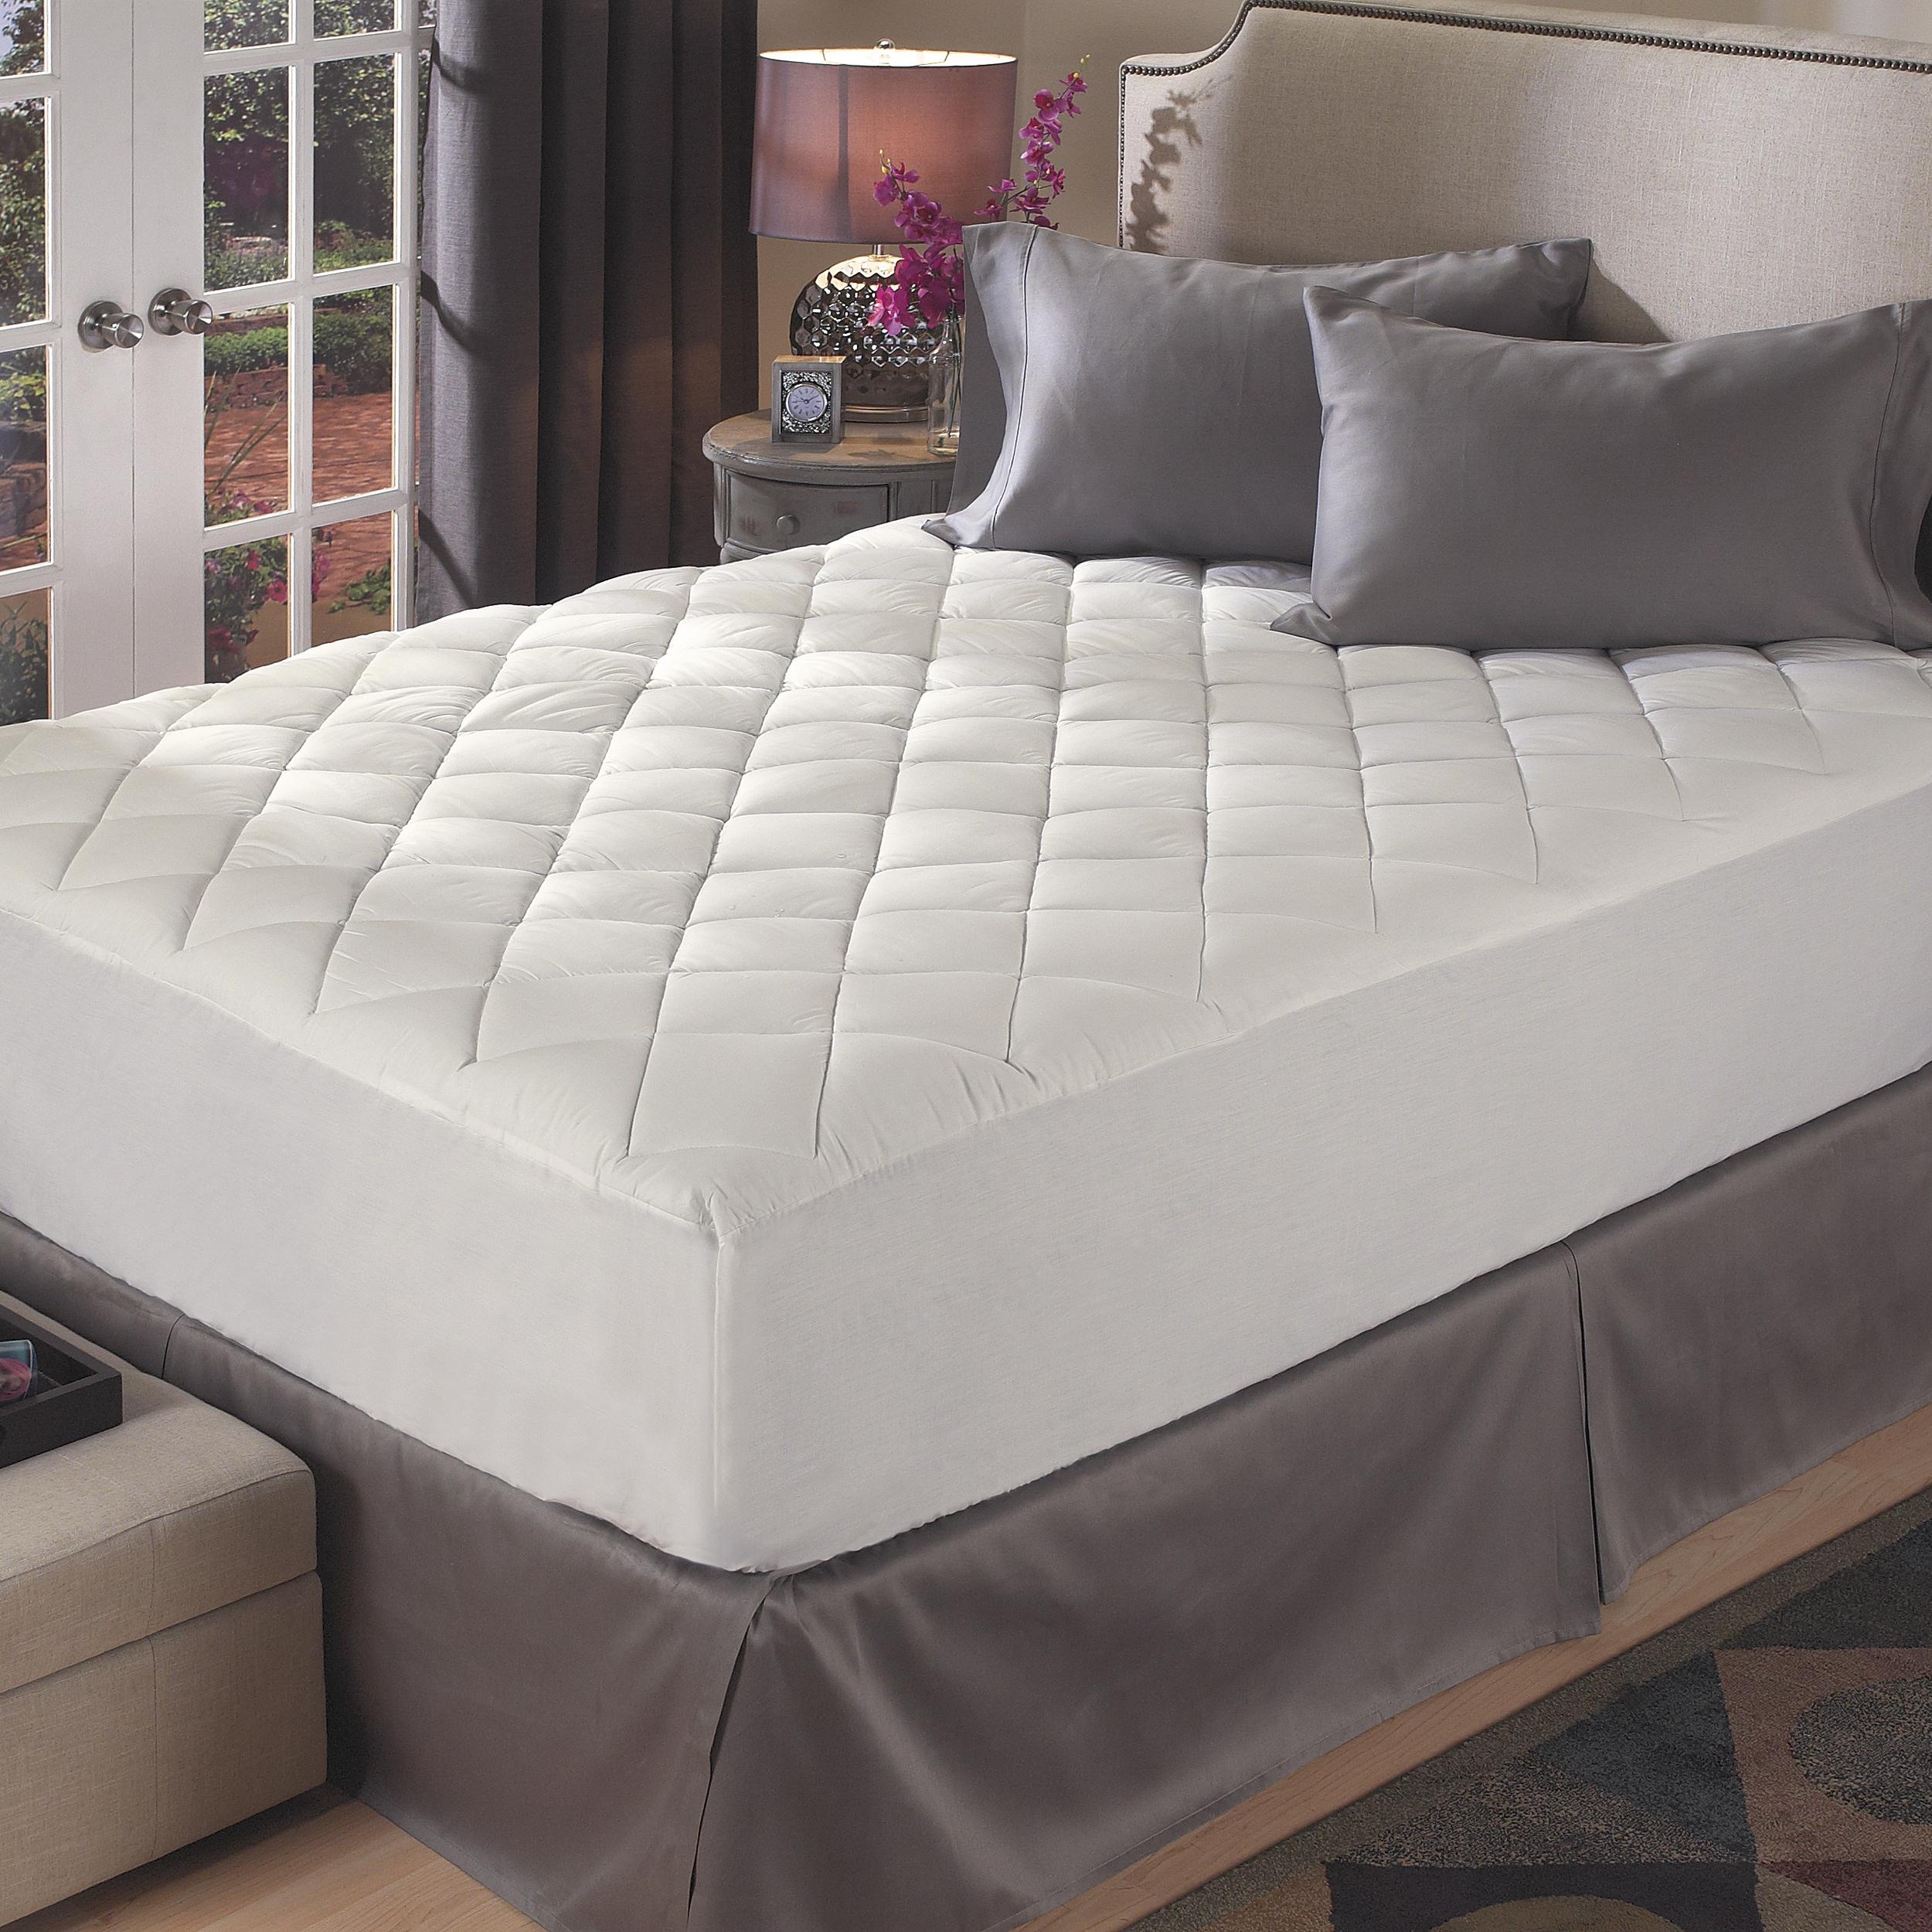 Comfort Inn Mattress Brand Hotel Super Topper Plush Comfort Mattress Pad Free